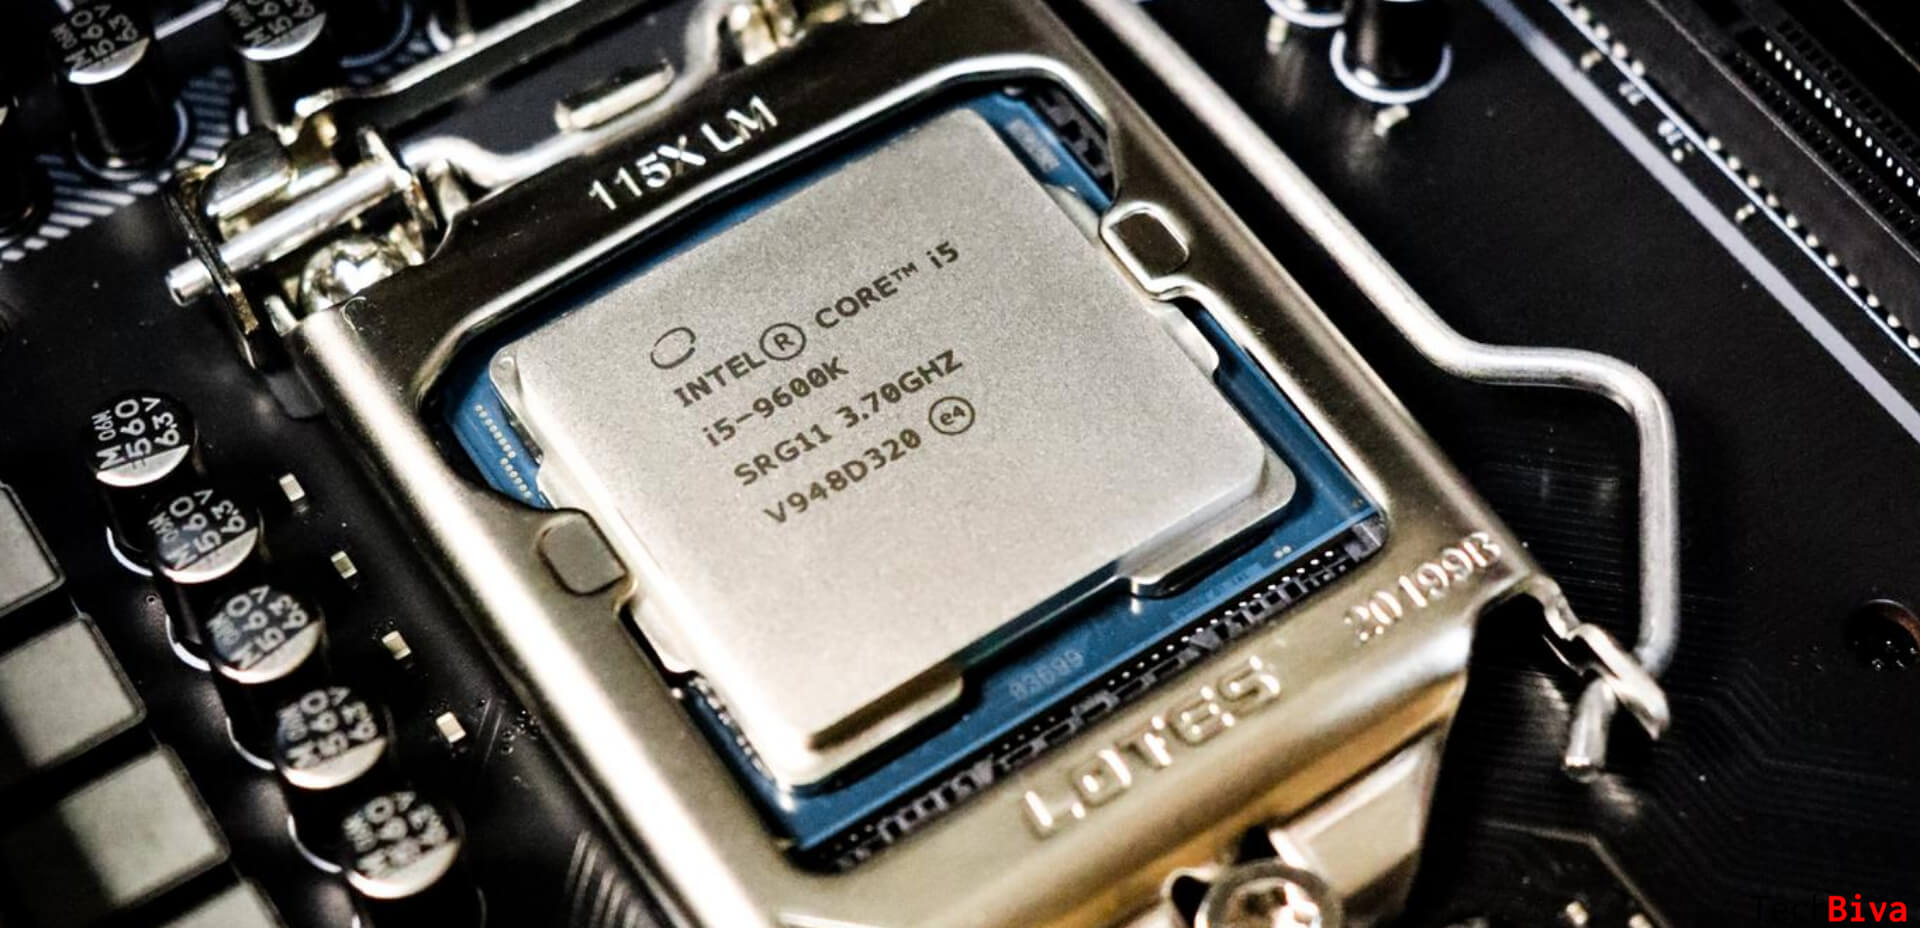 Intel Celeron VS i5